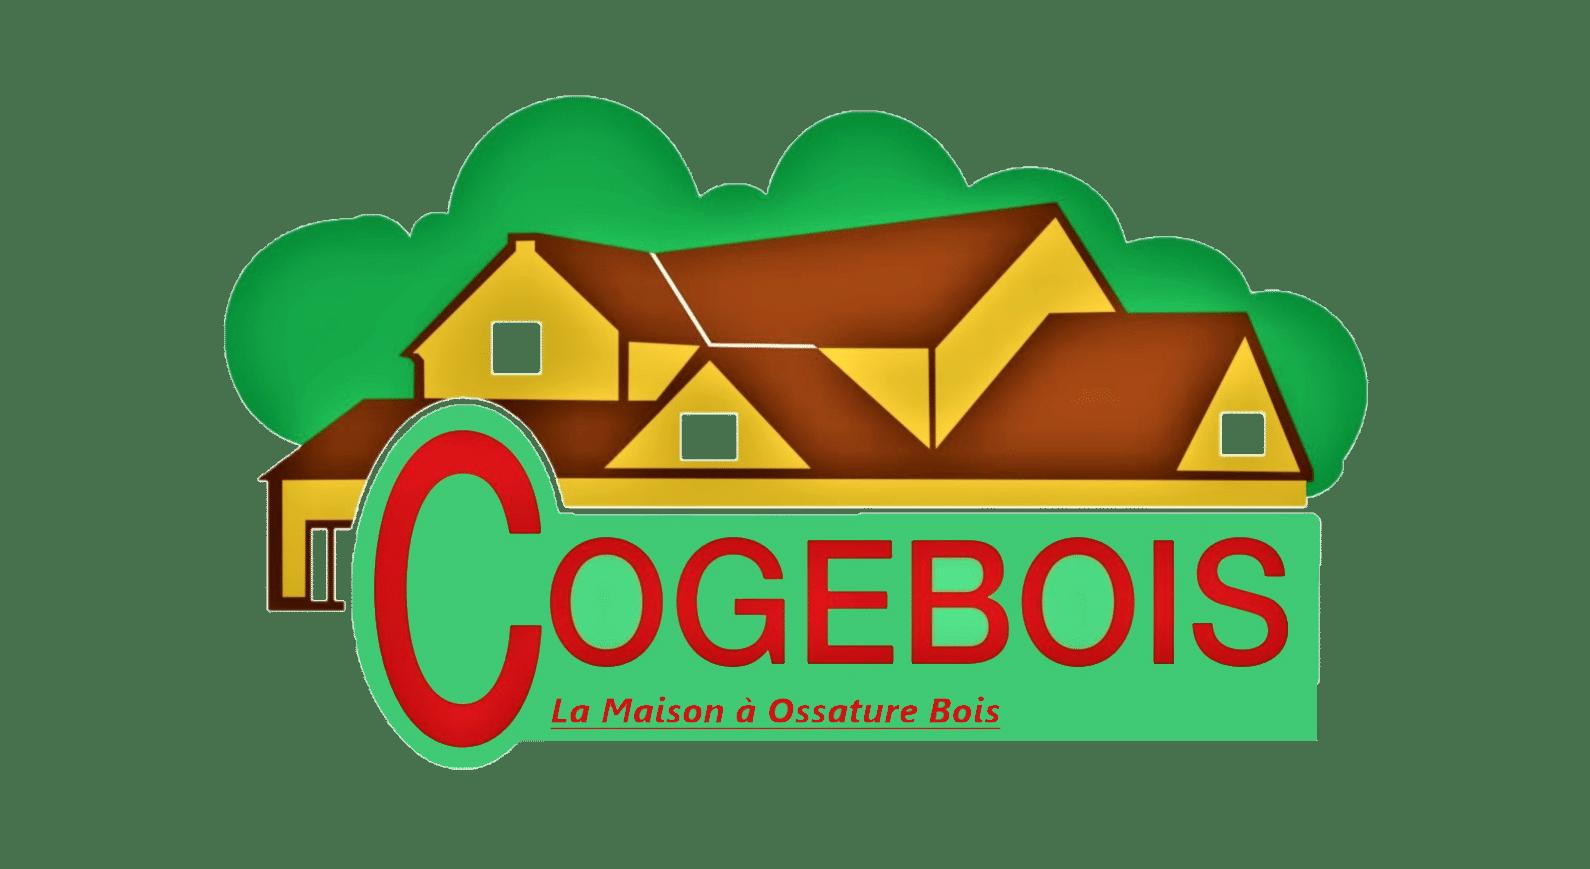 Cogebois Logo